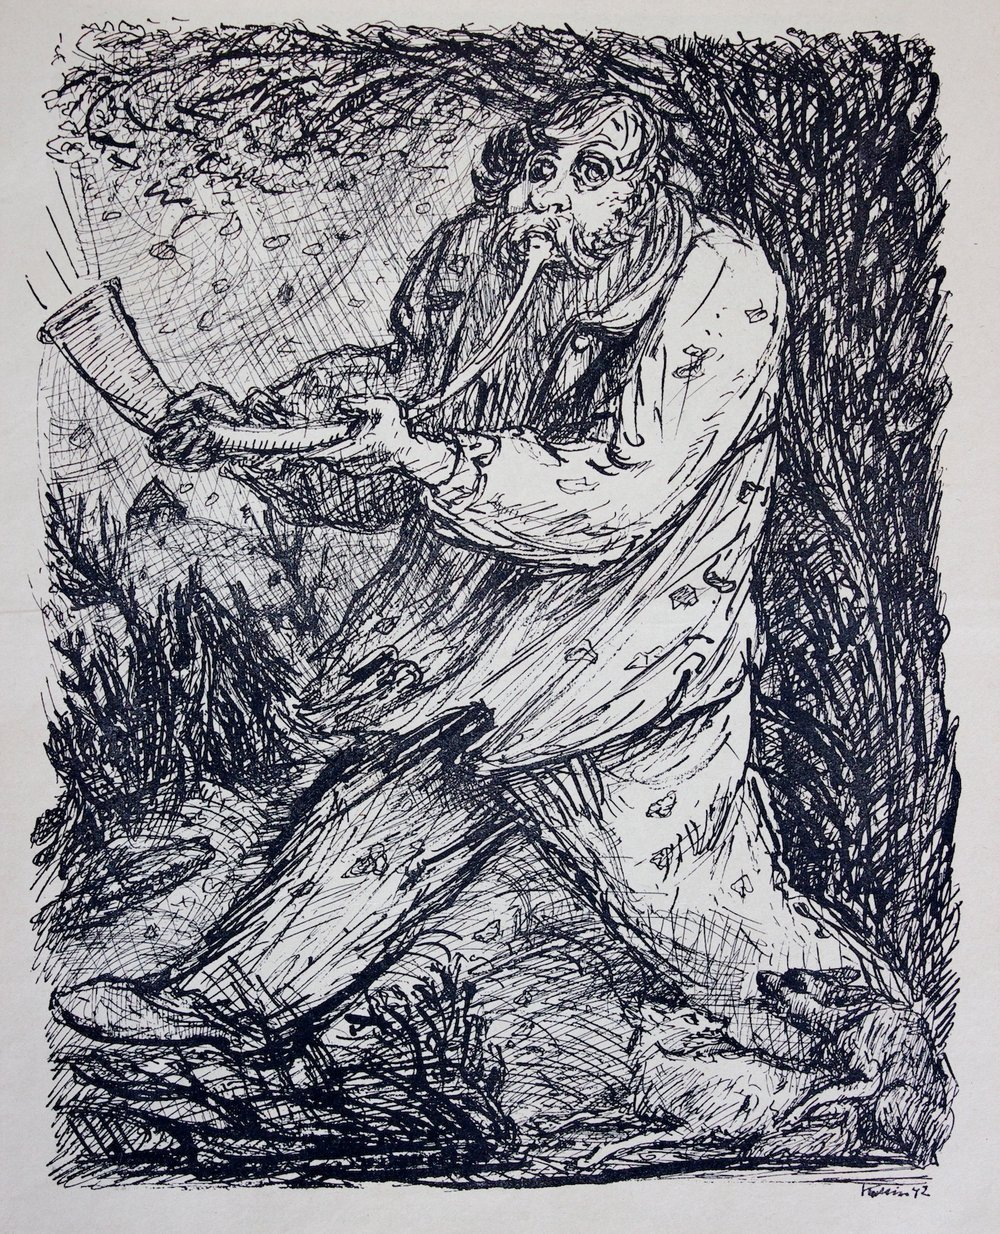 Alfred Kubin / Der Sturm (The storm)/ Lithograph on paper (Litografia su carta) / 1942